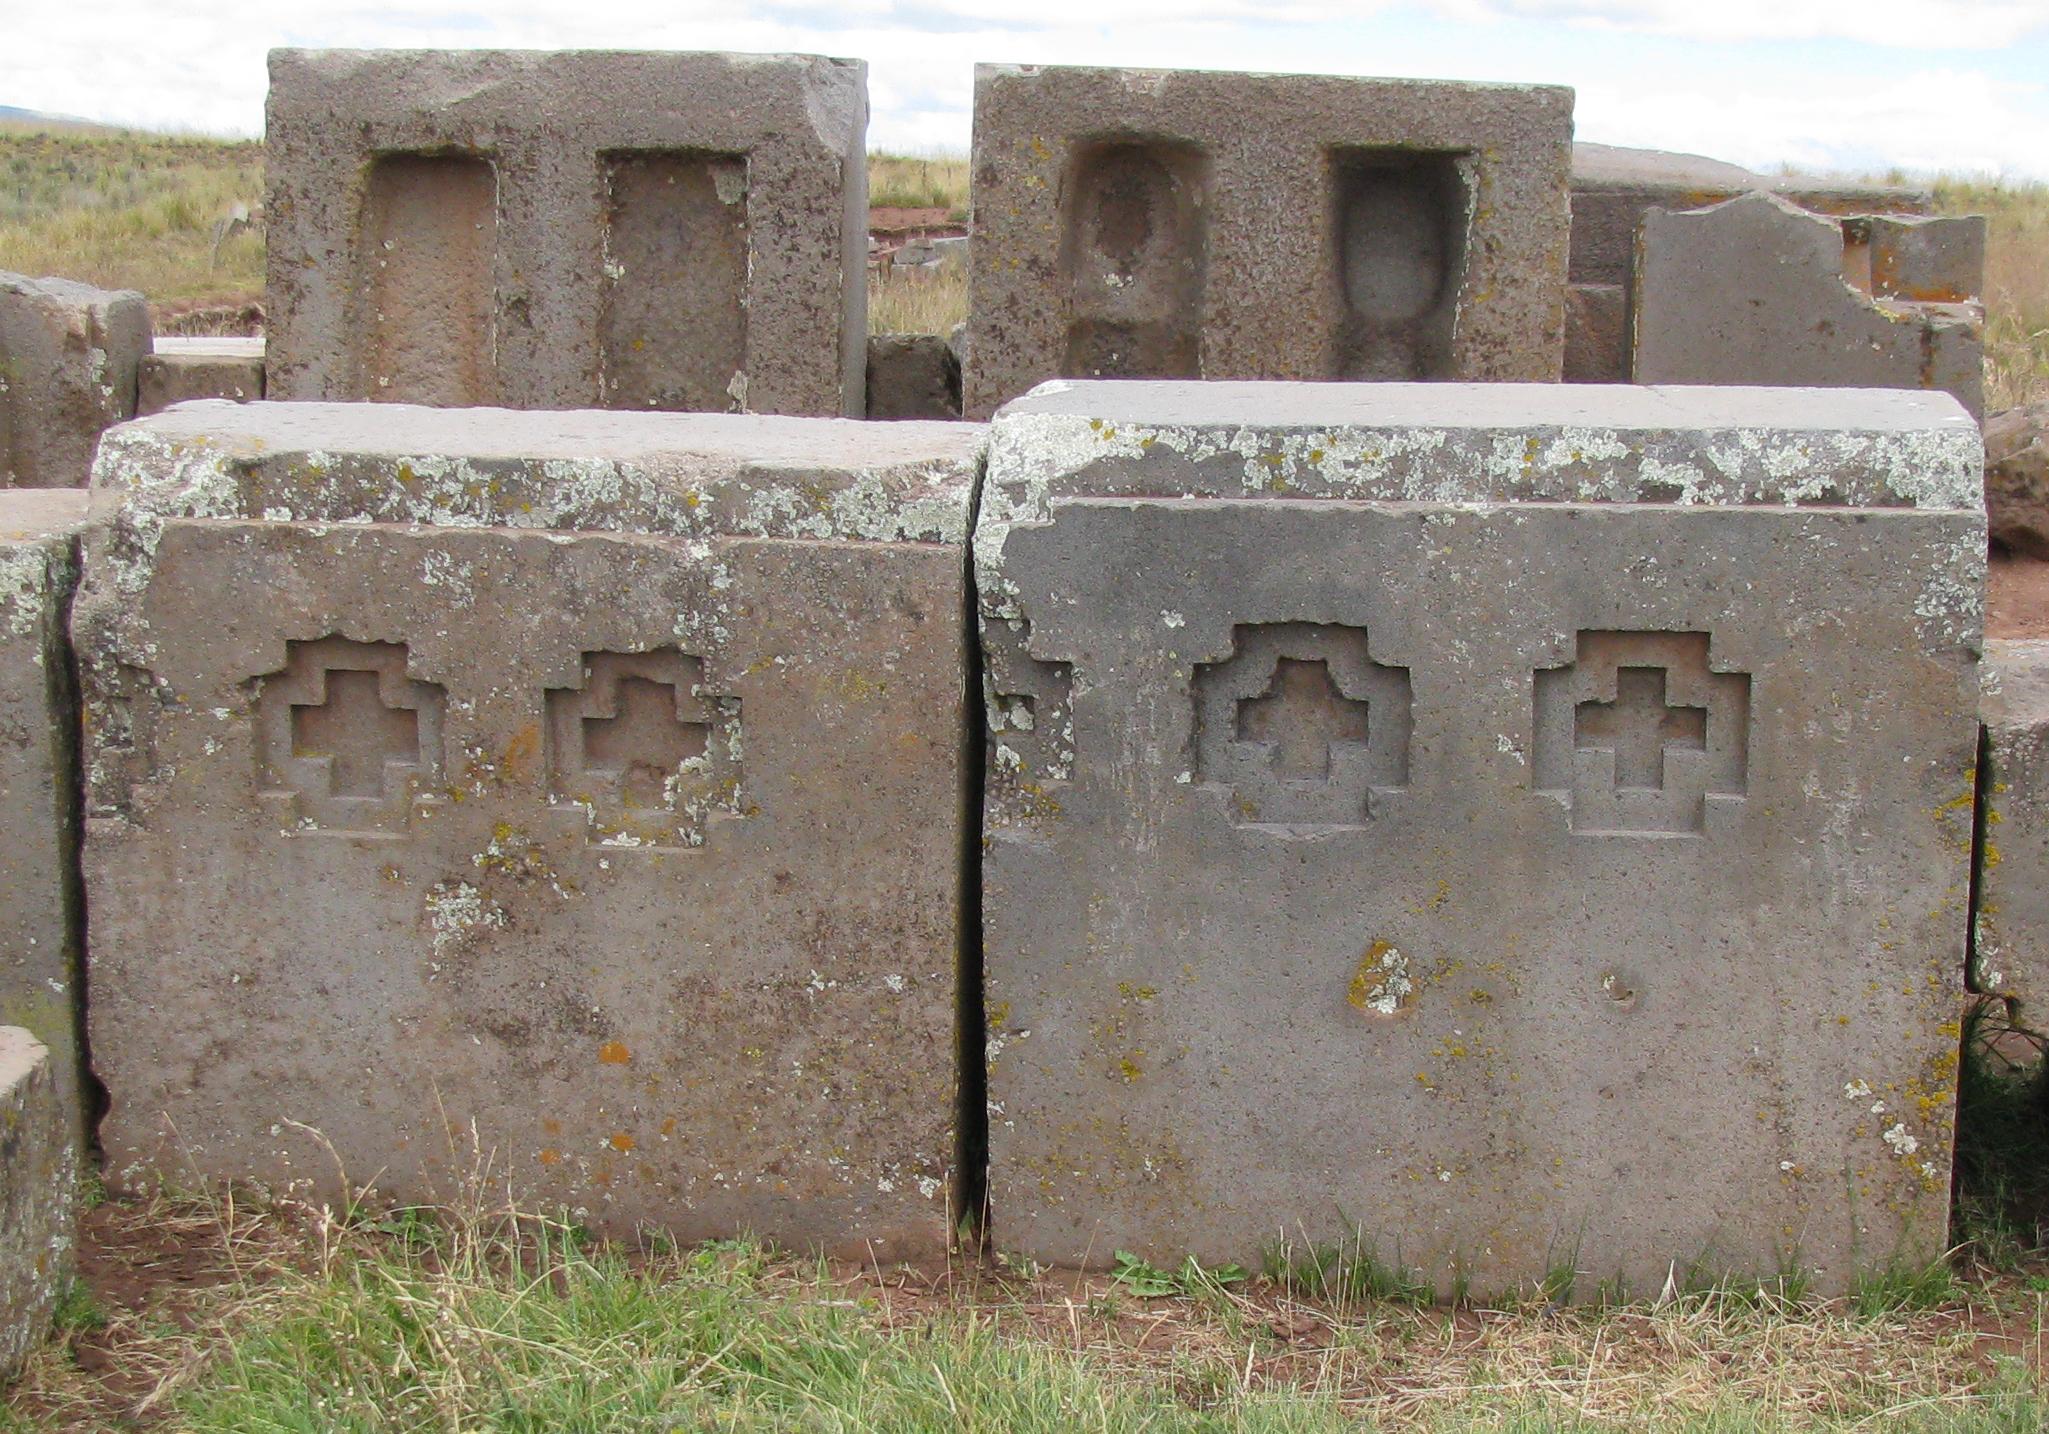 The ruins of Puma Punku